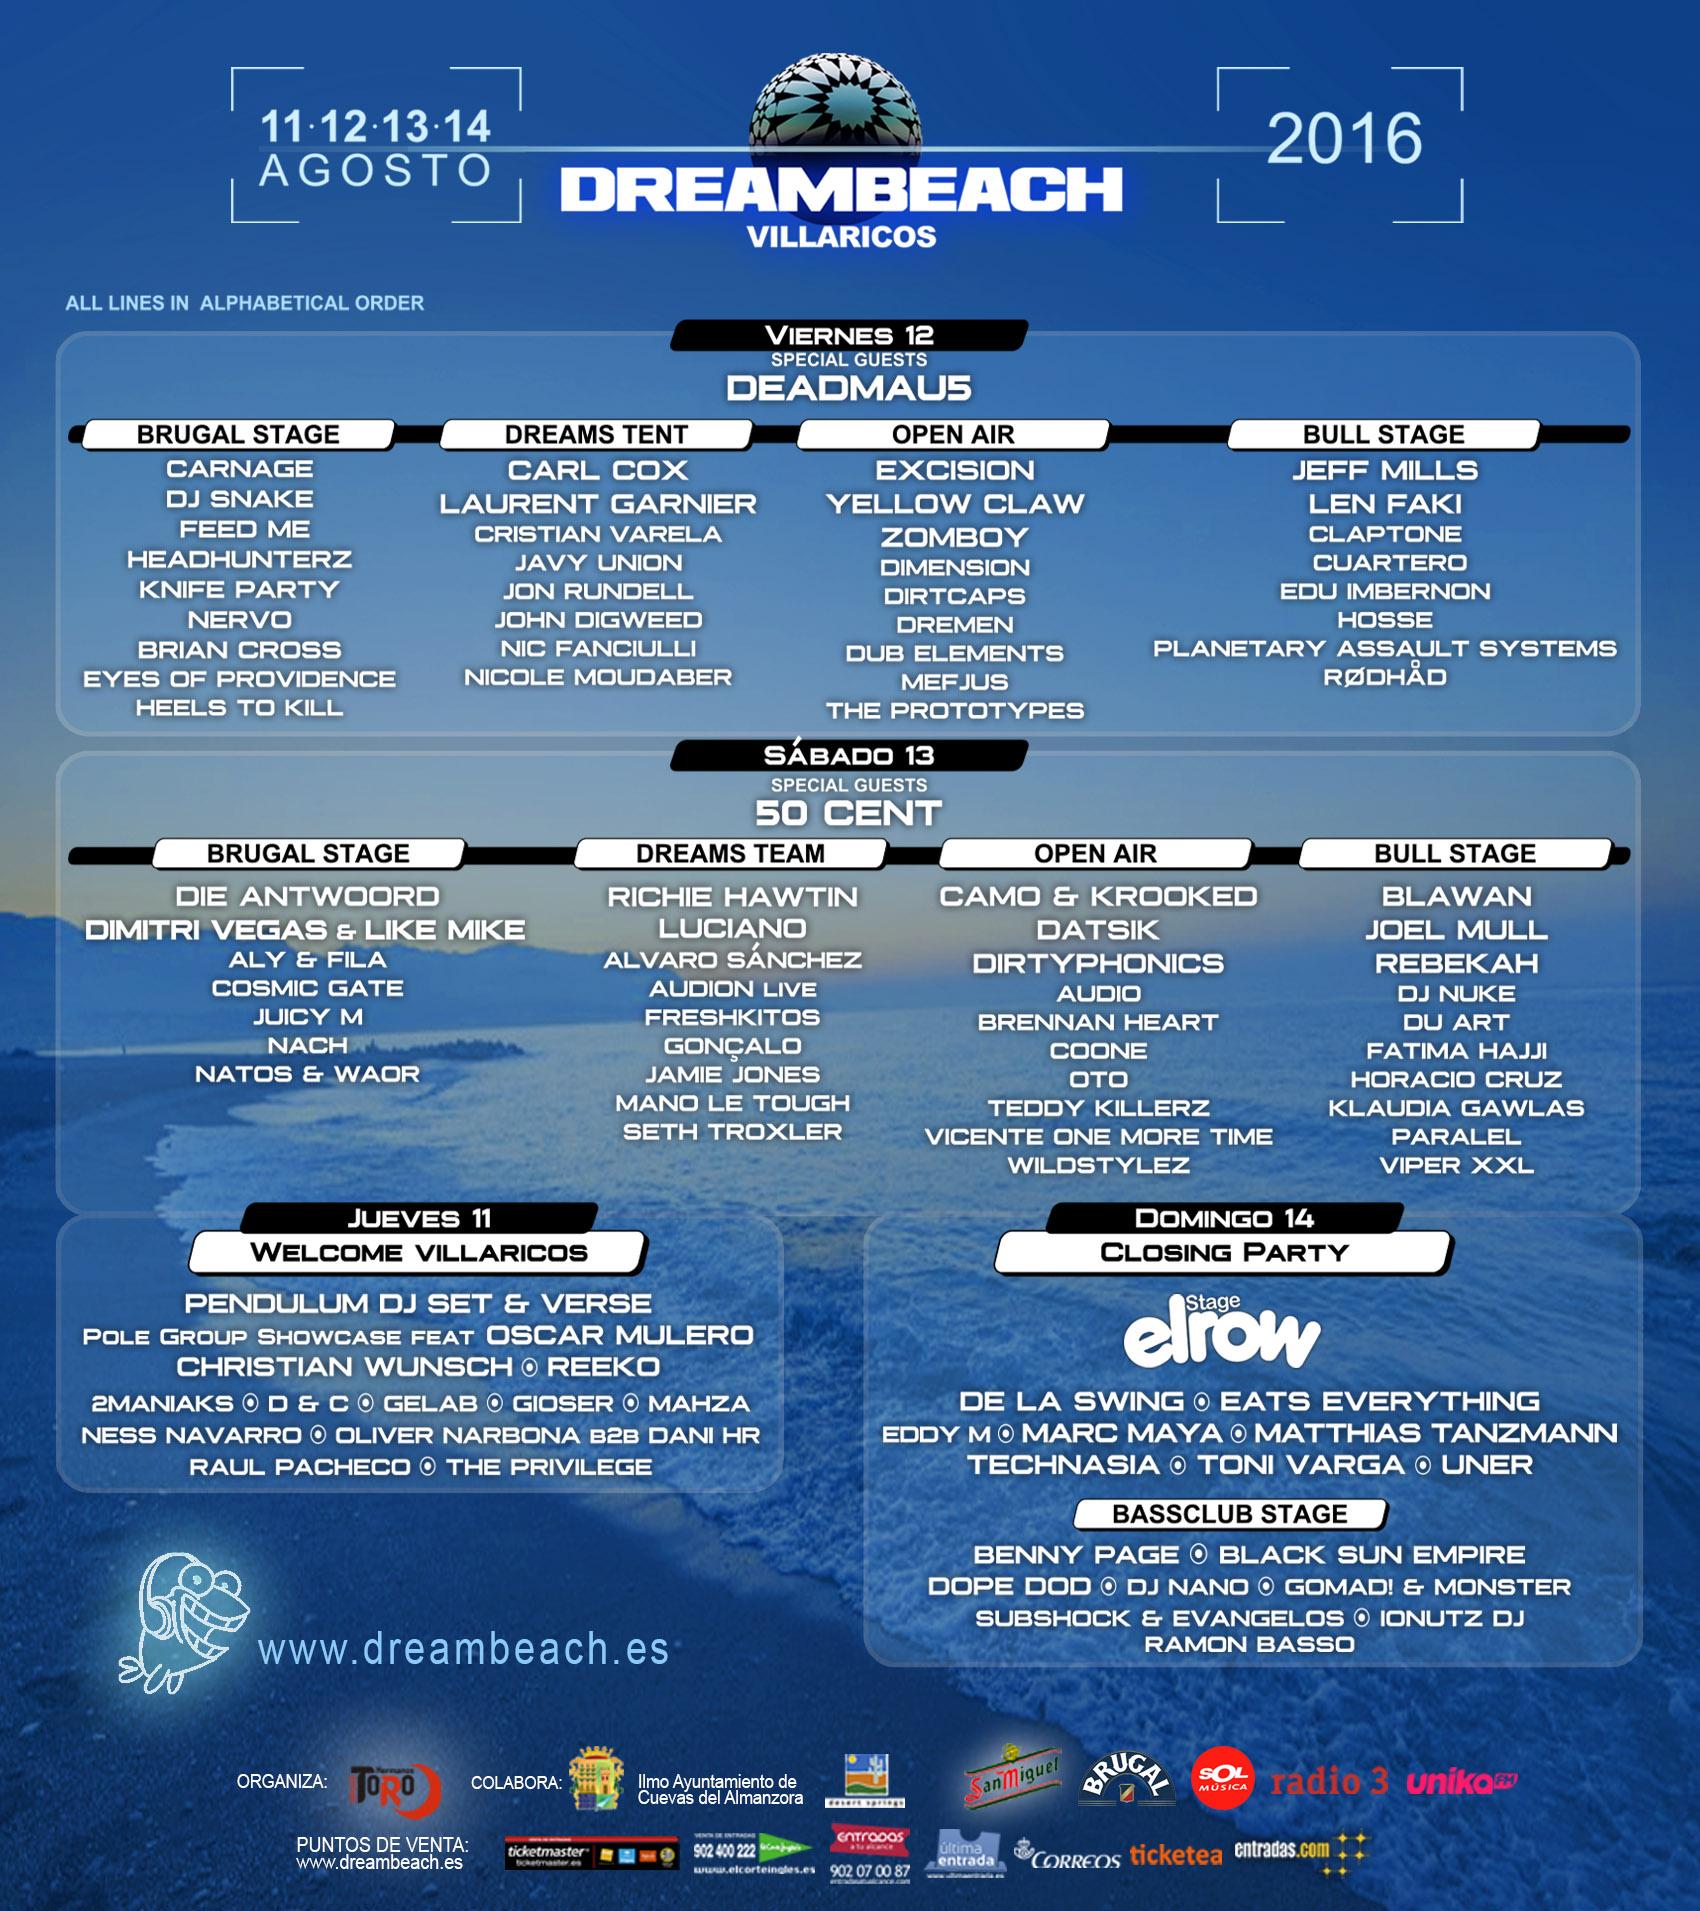 DREAMBEACH VILLARICOS 2016